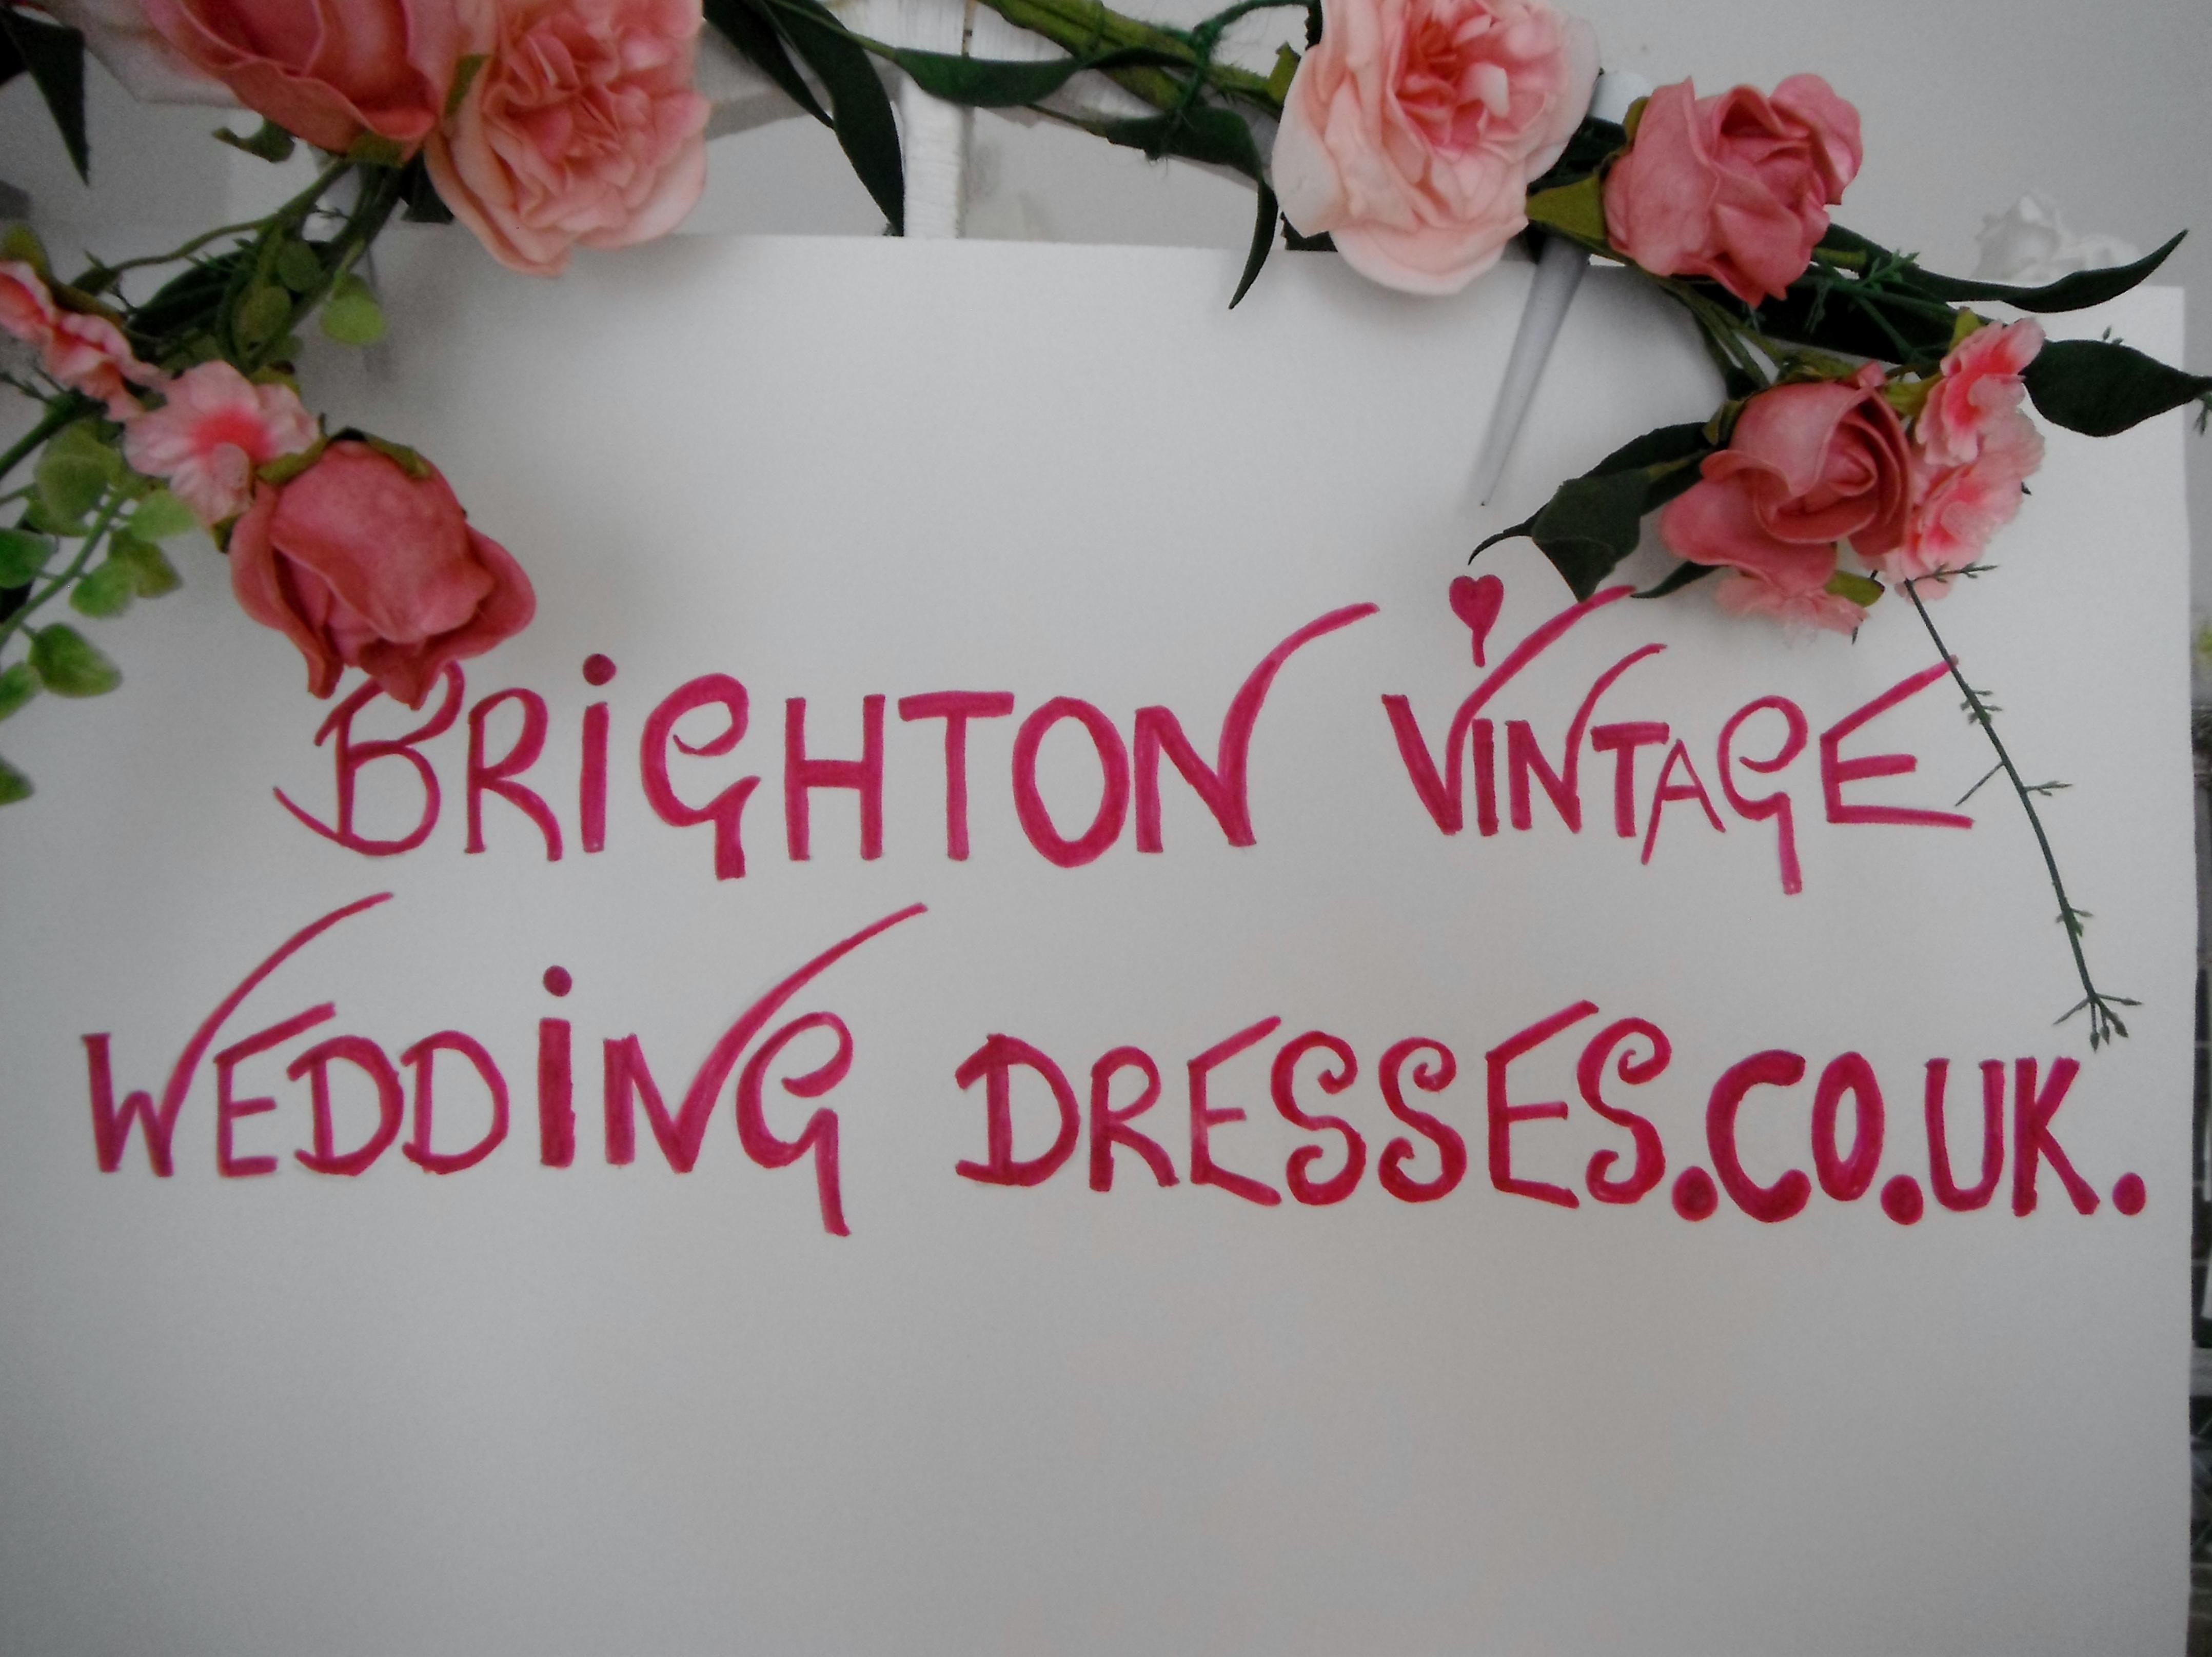 Vintage Wedding Dresses East Sussex: Vintage Style Wedding Dresses